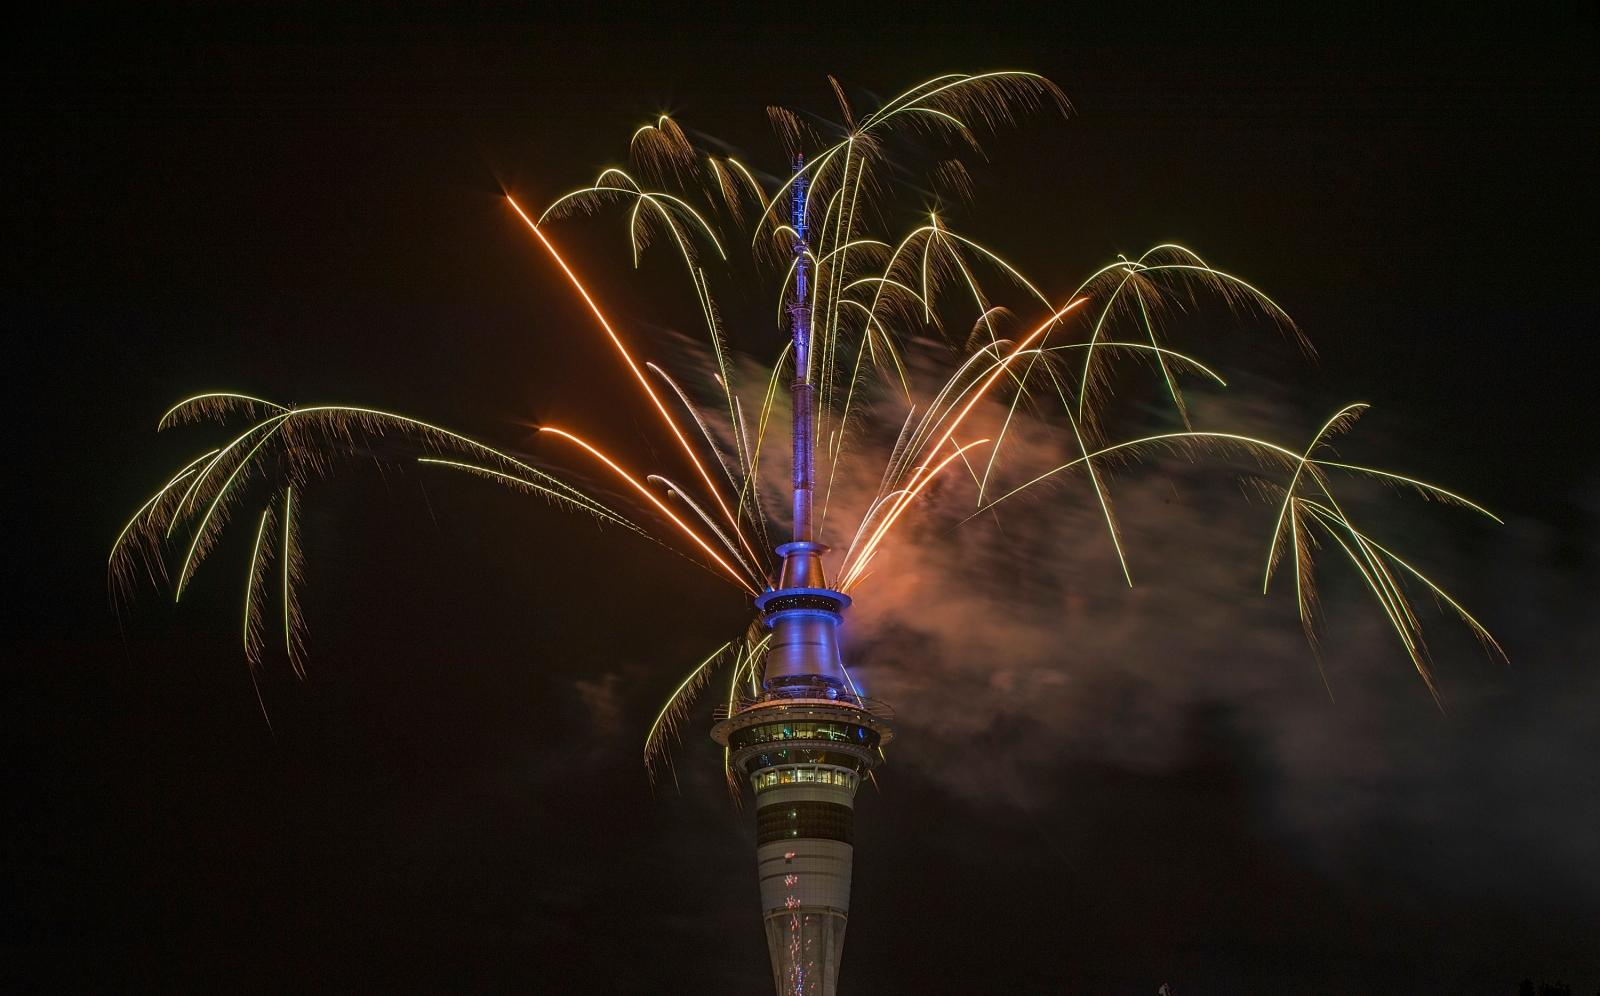 New Zealand New Year